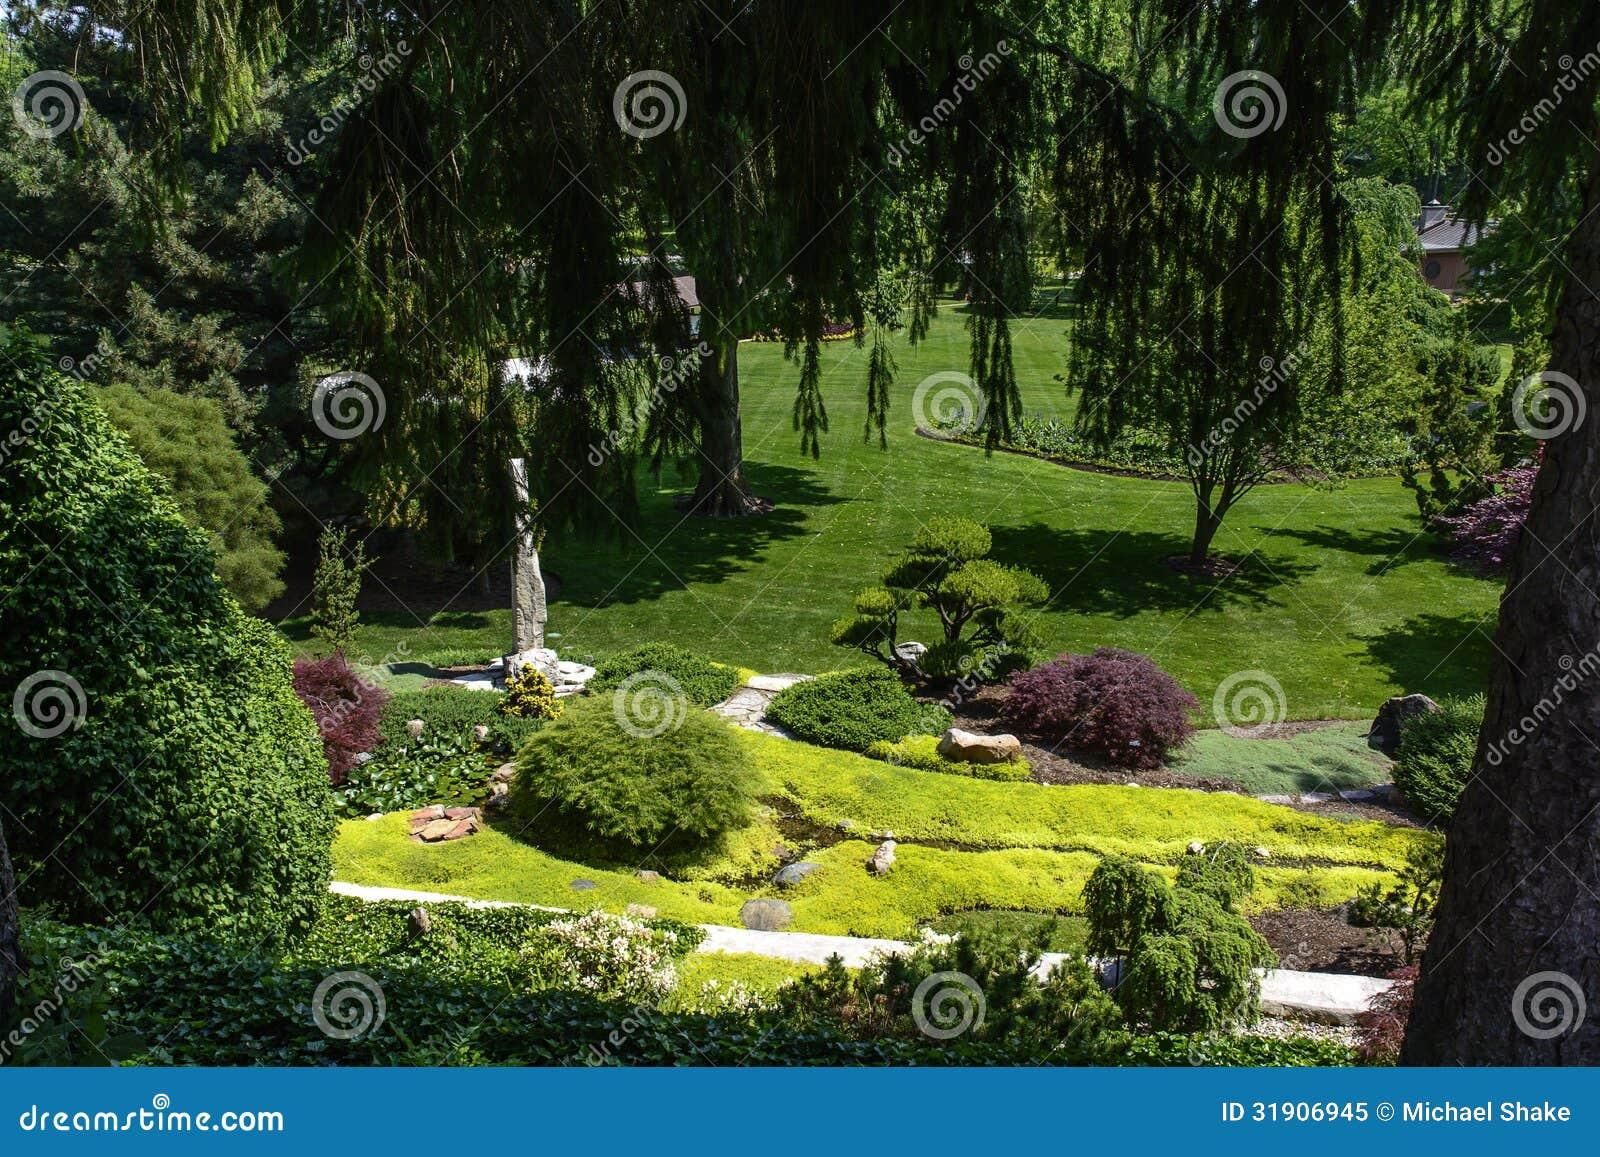 Botanical garden stock image image of garden landscaping for Ornamental trees for flower beds